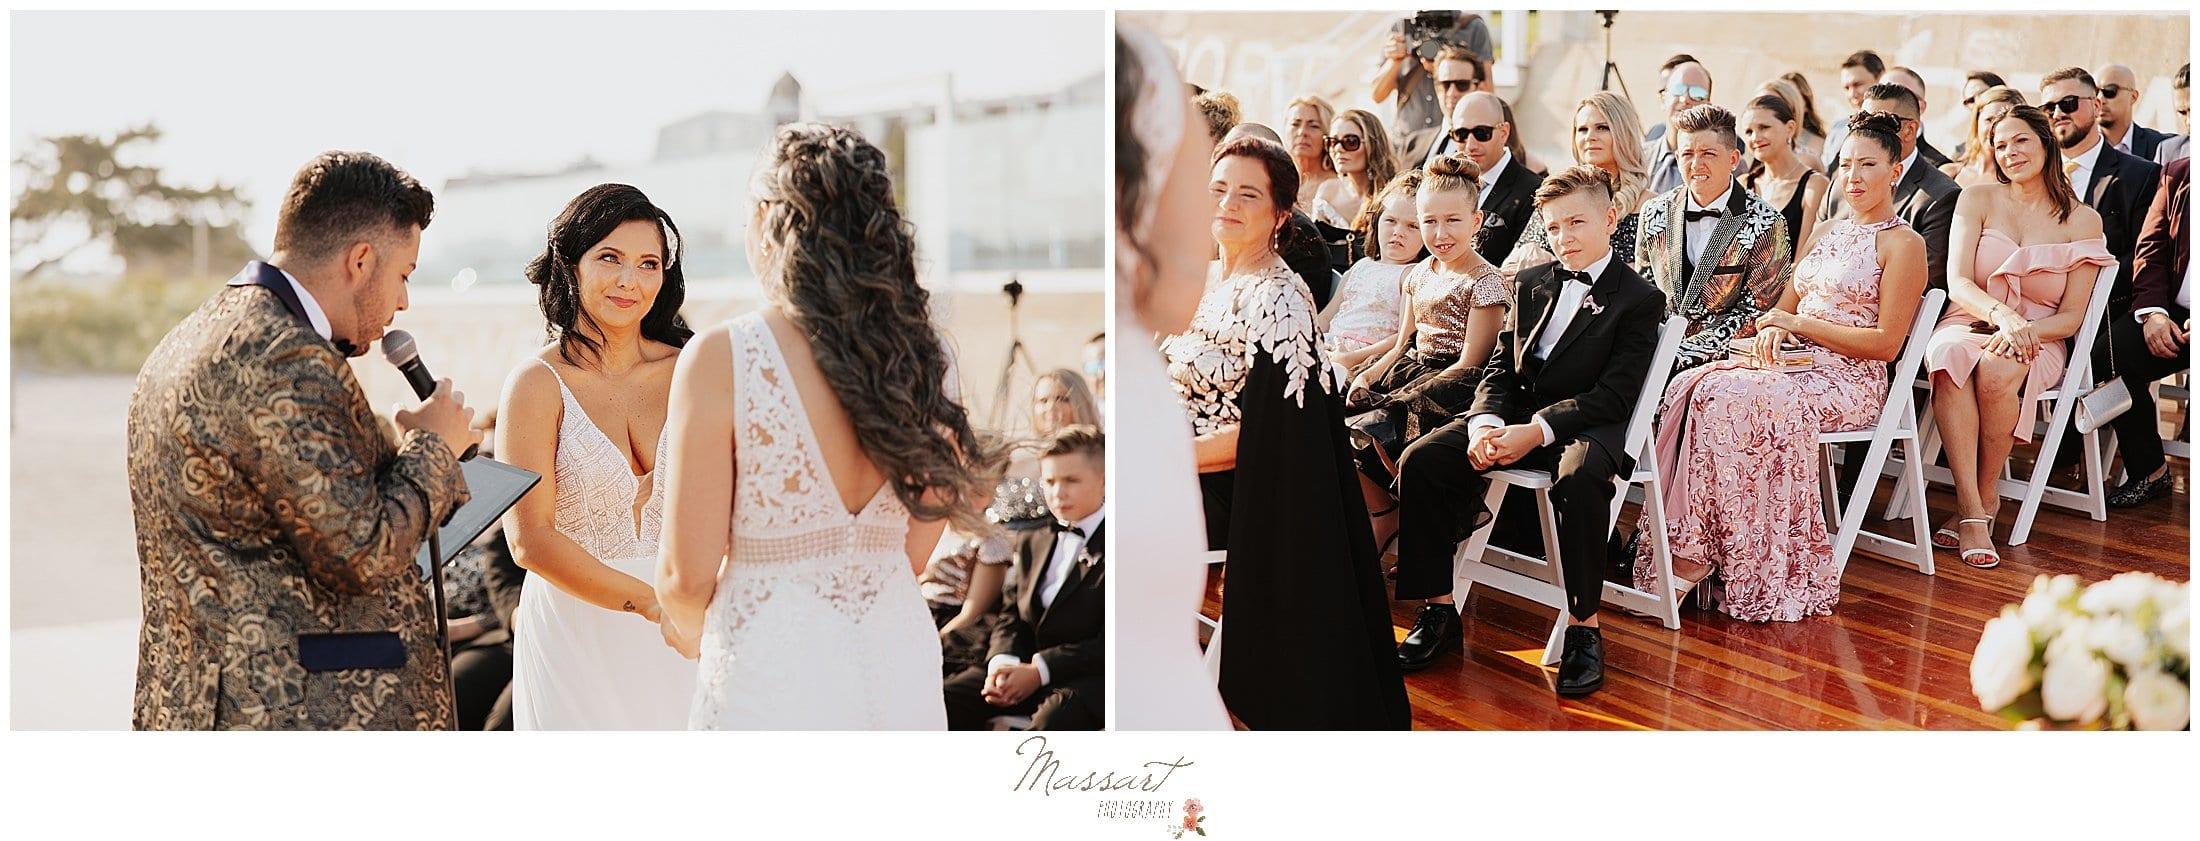 women exchange vows during Newport Beach House wedding ceremony